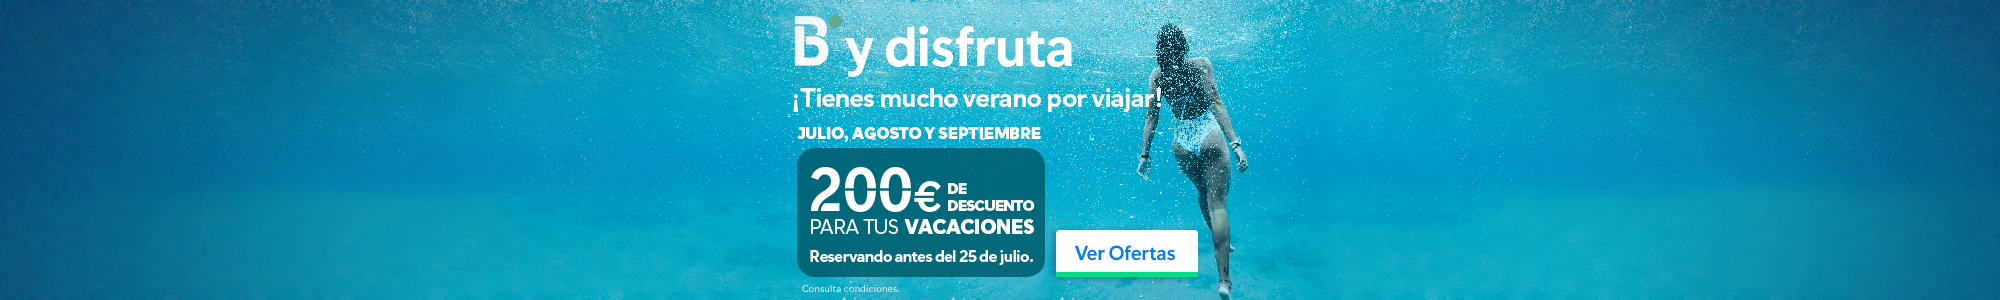 Ofertas B y Disfruta - B the travel brand